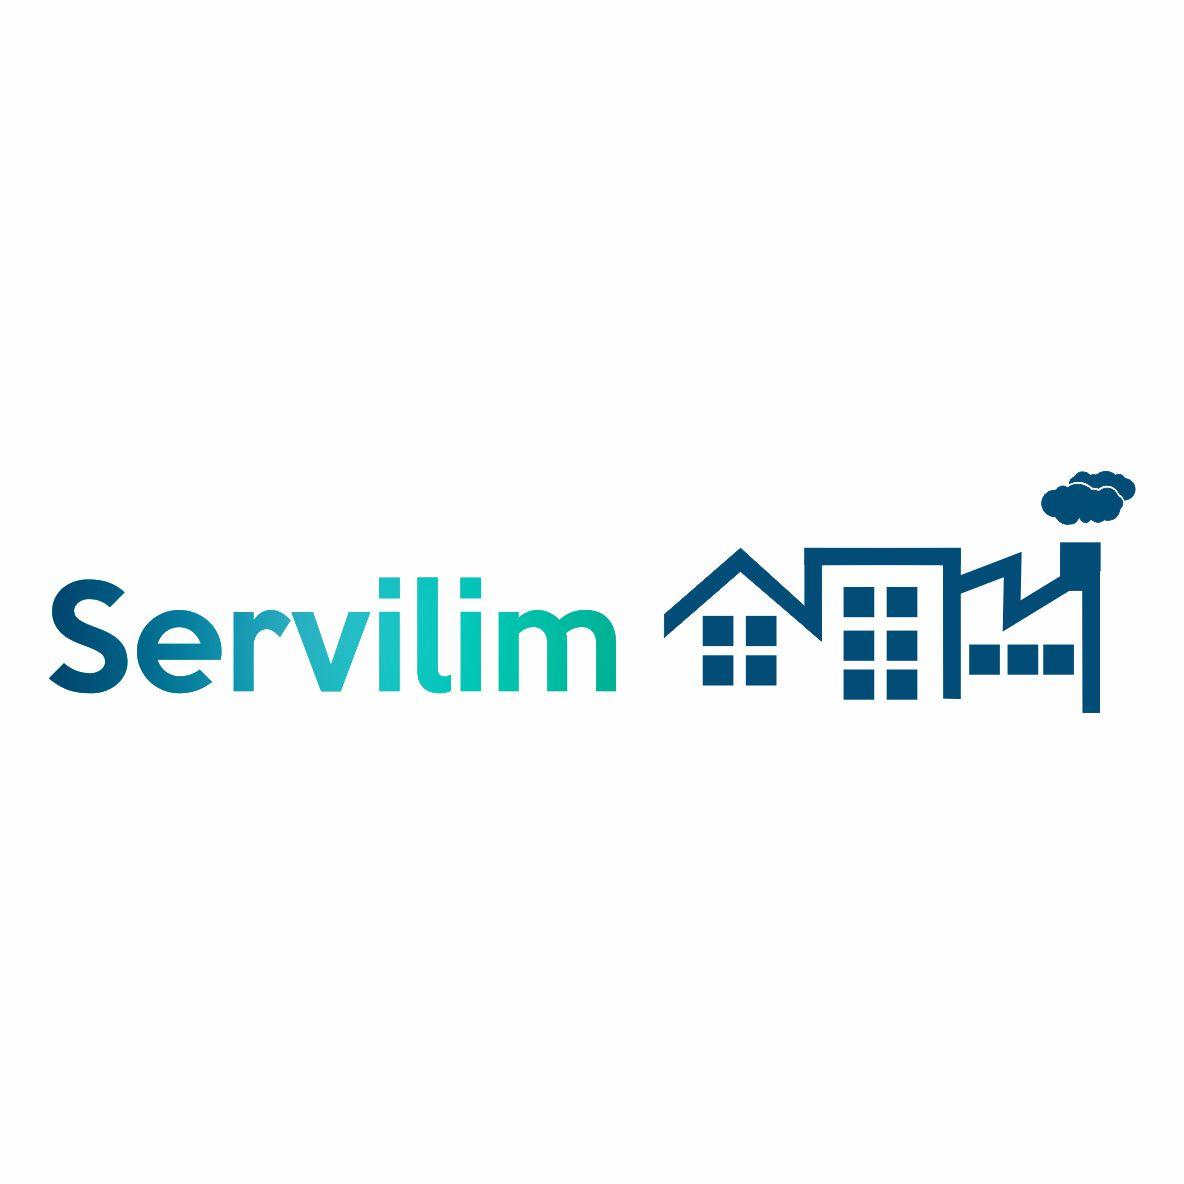 Servilim